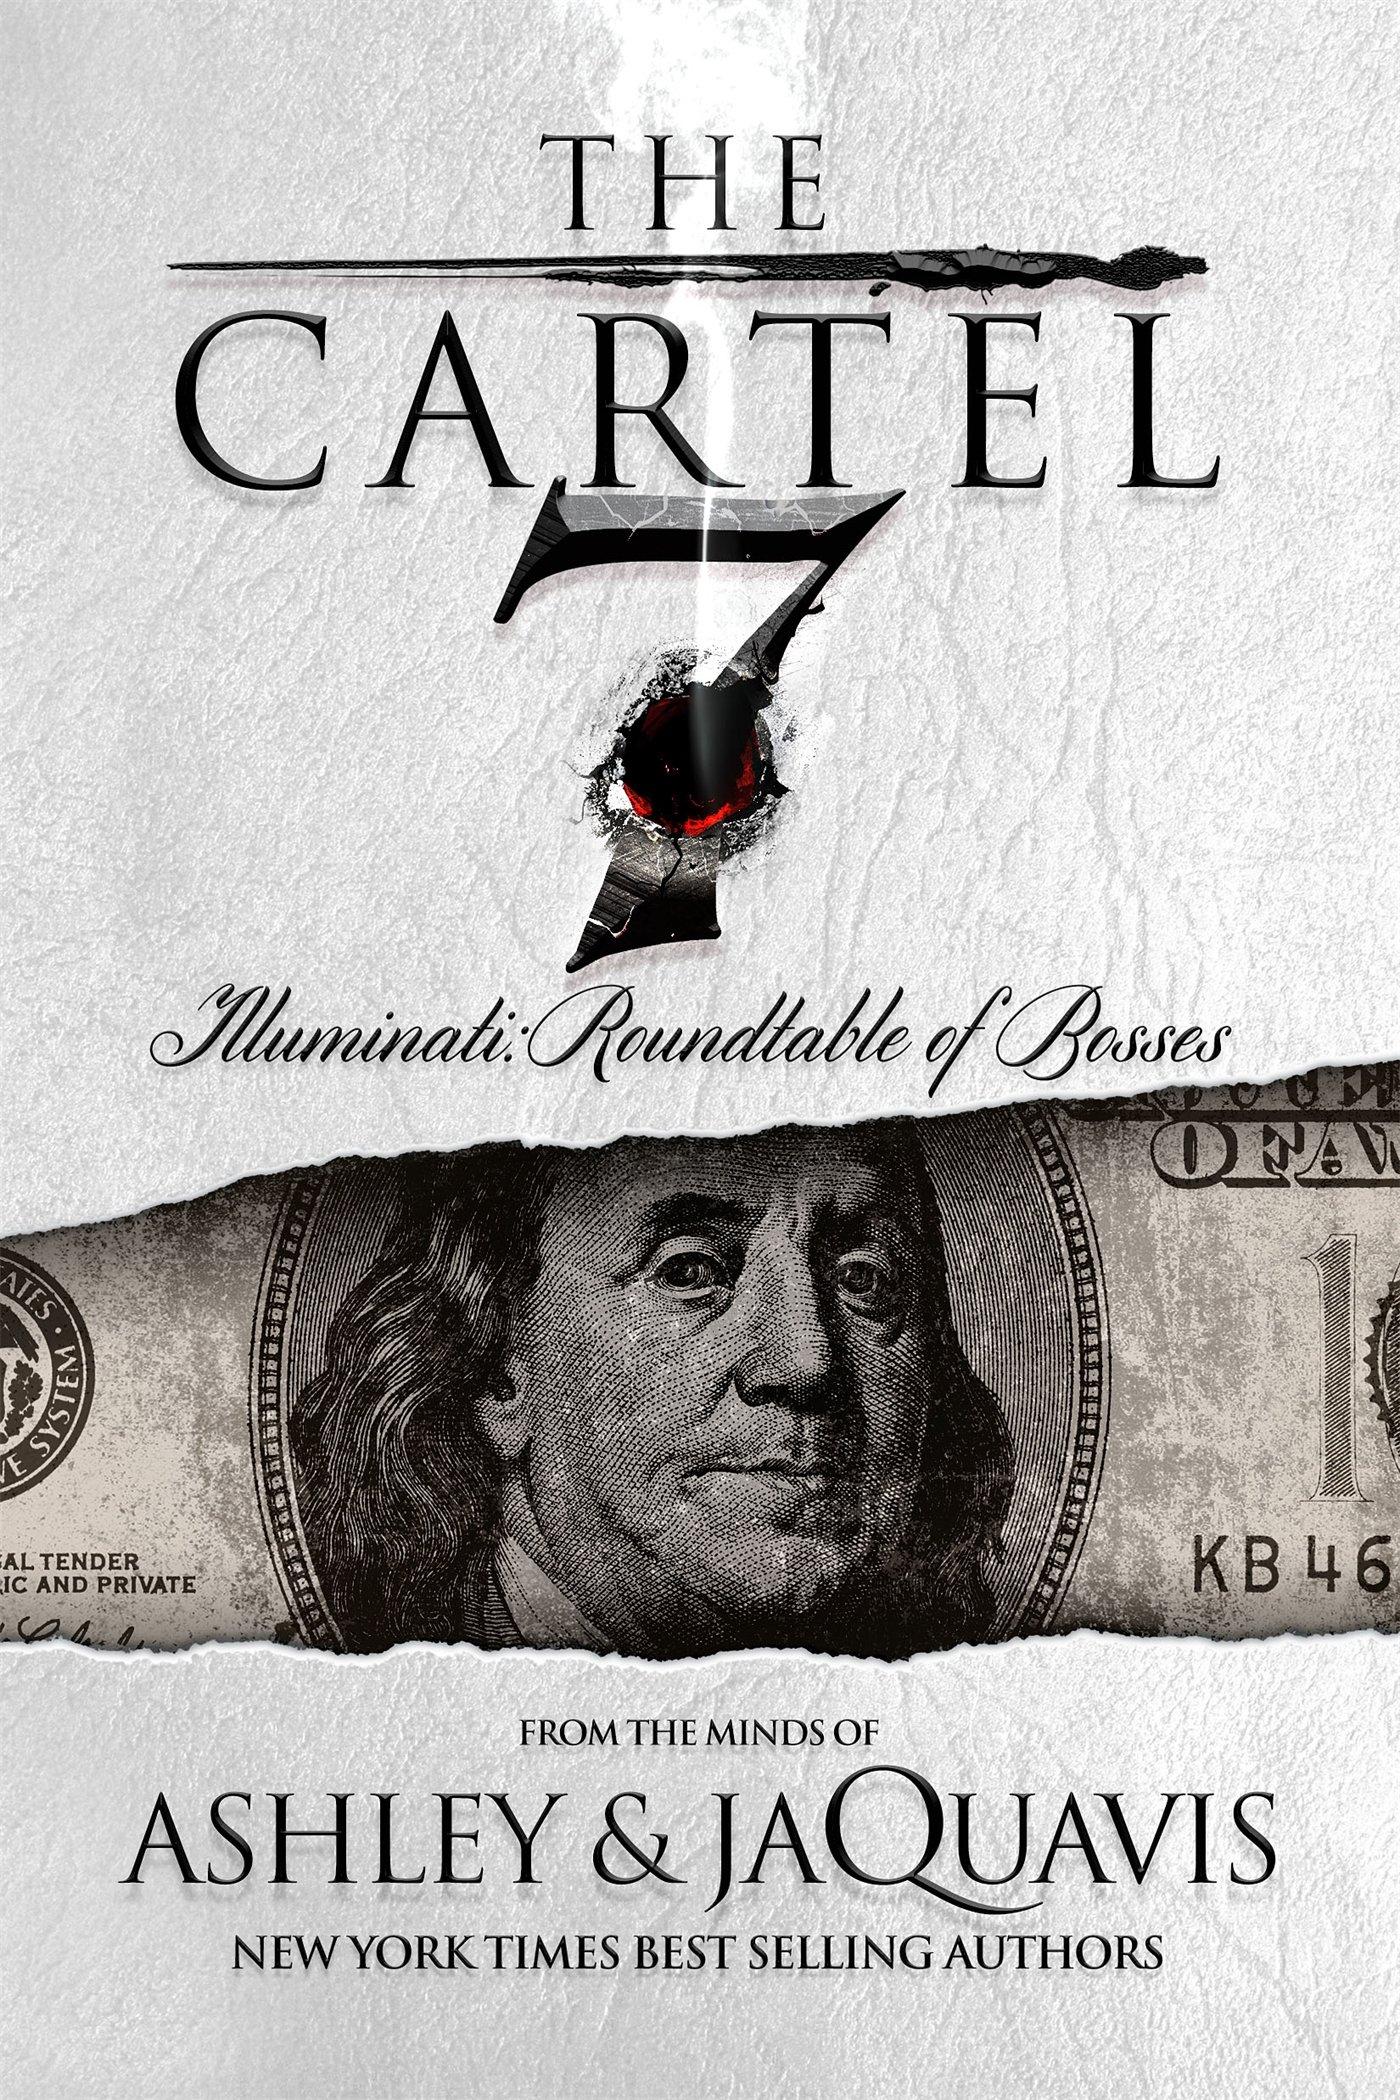 Amazon.com: The Cartel 7: Illuminati: Roundtable of Bosses ...